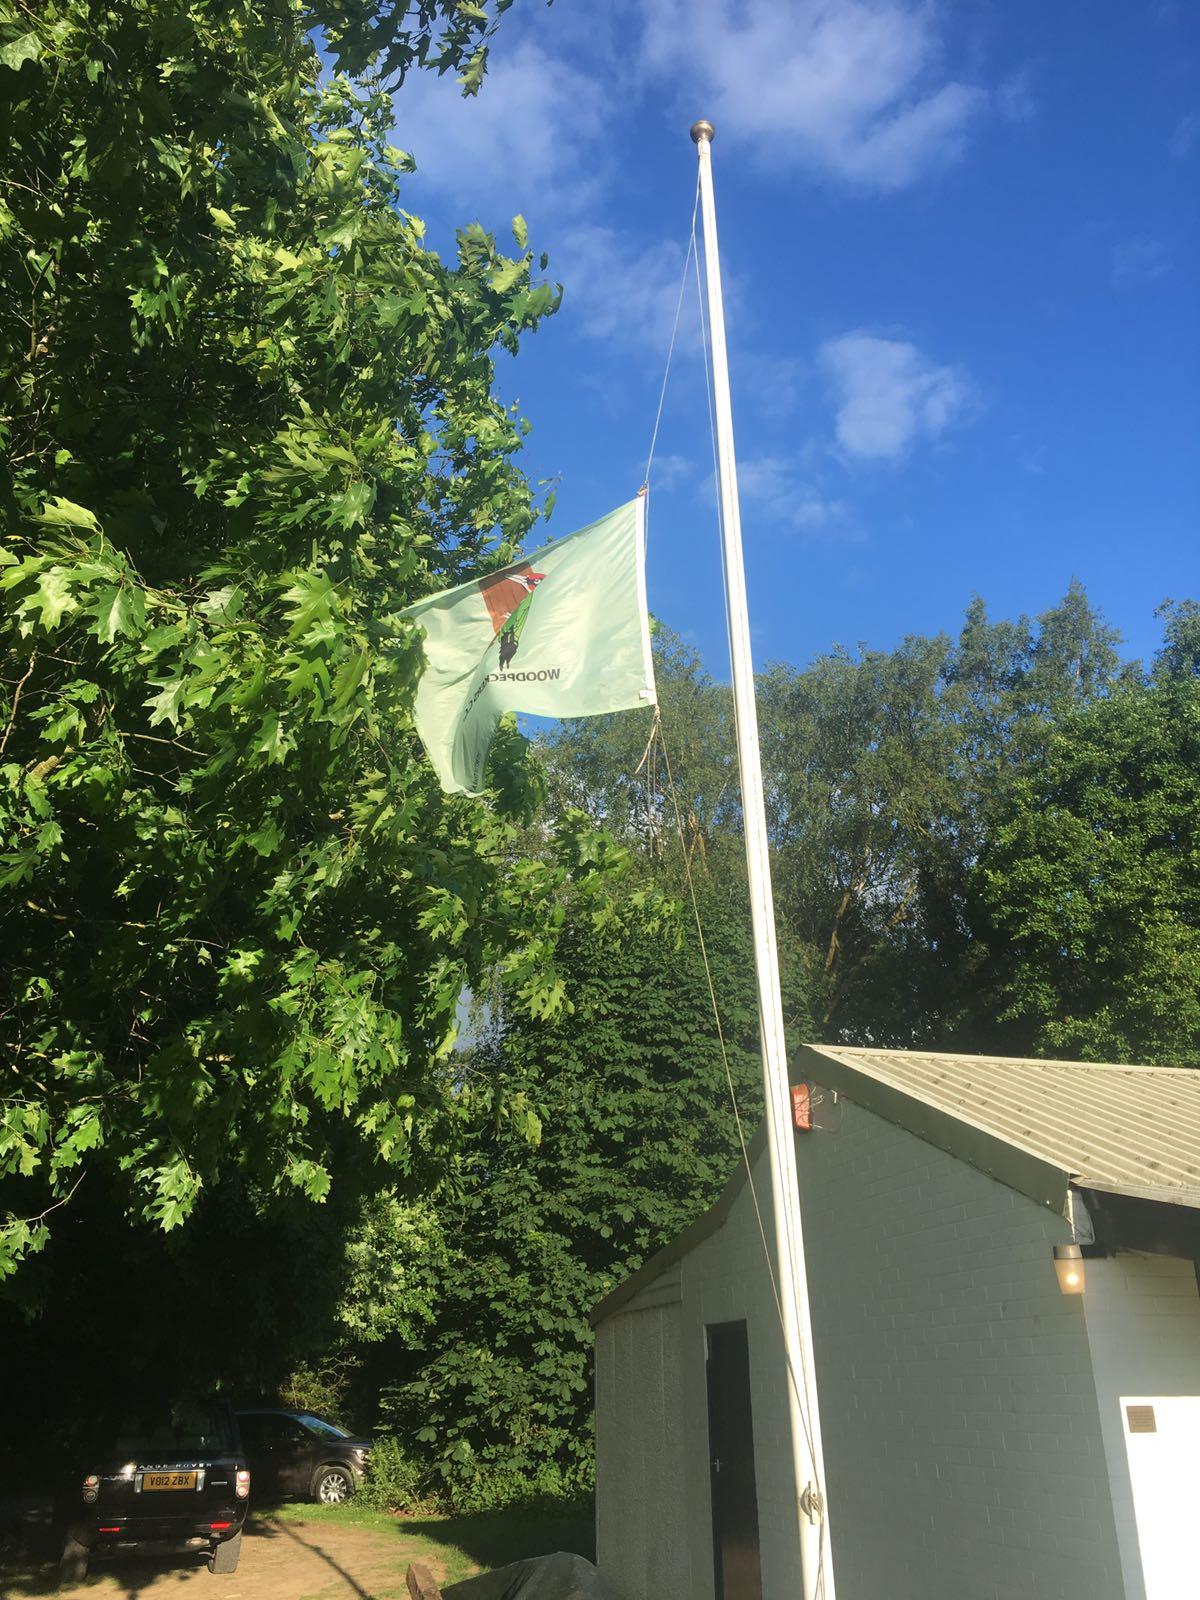 headley flag peckers